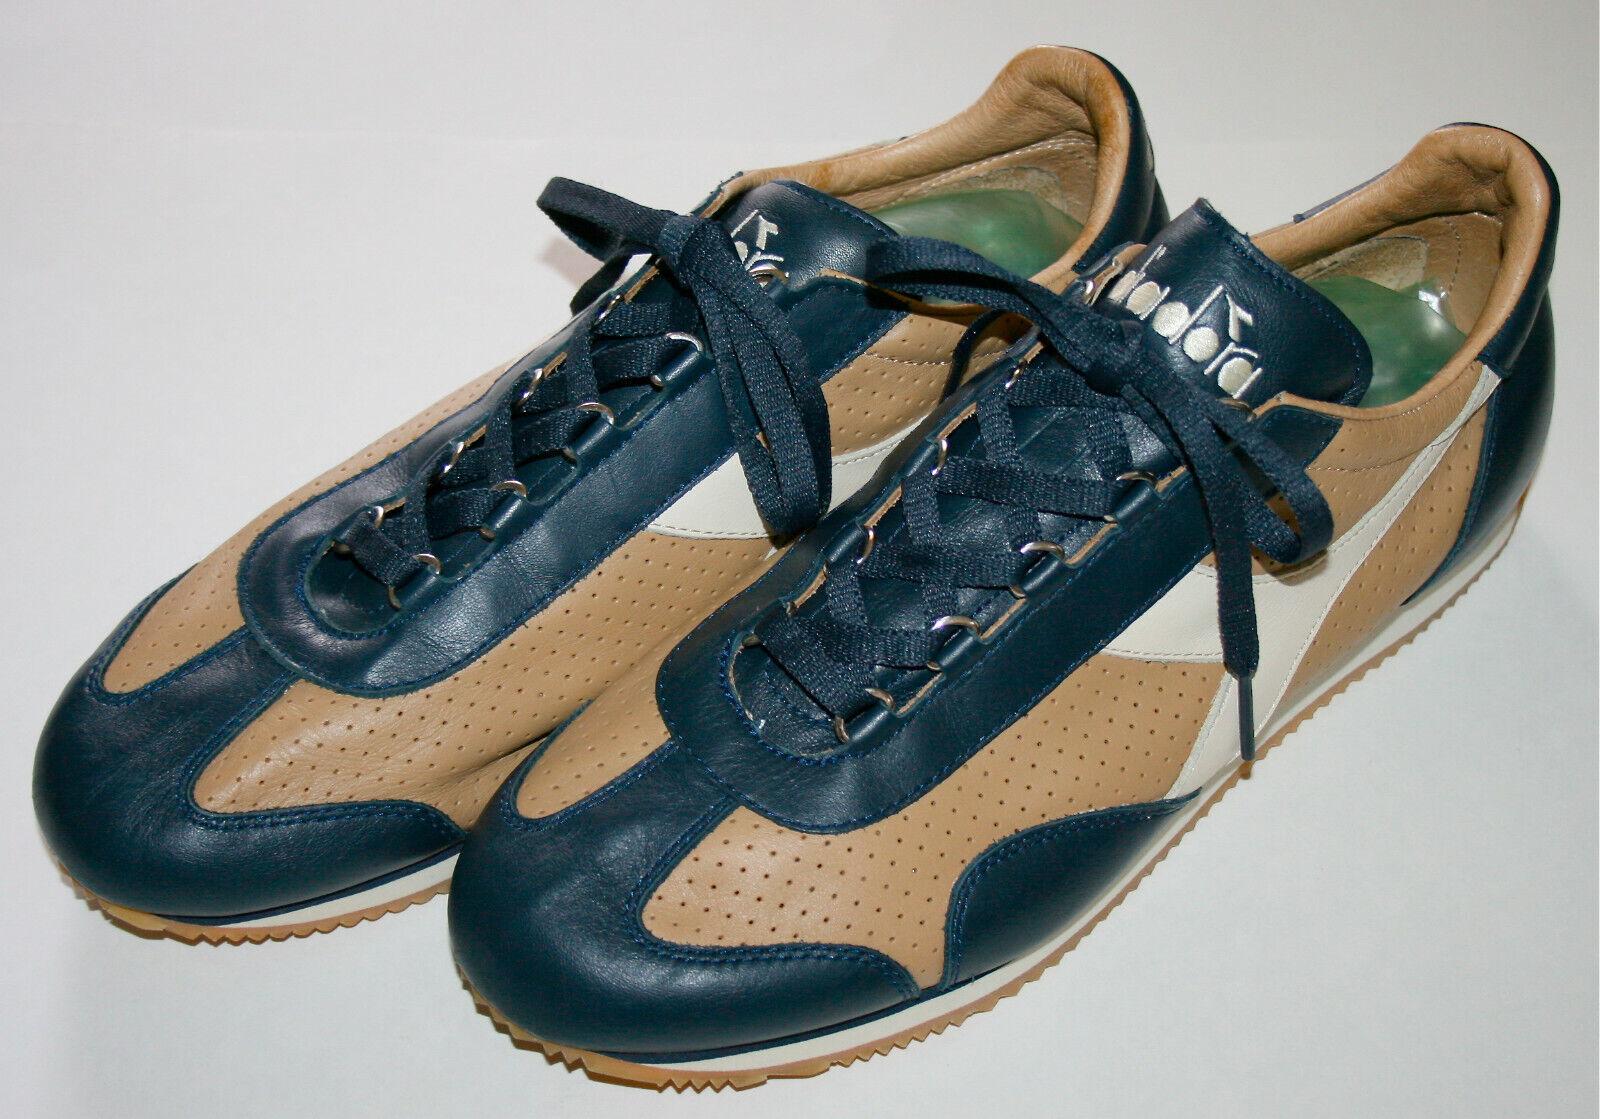 Diadora Leather Shoes Sneaker US12  UK11.5  EUR46 Tan/Navy